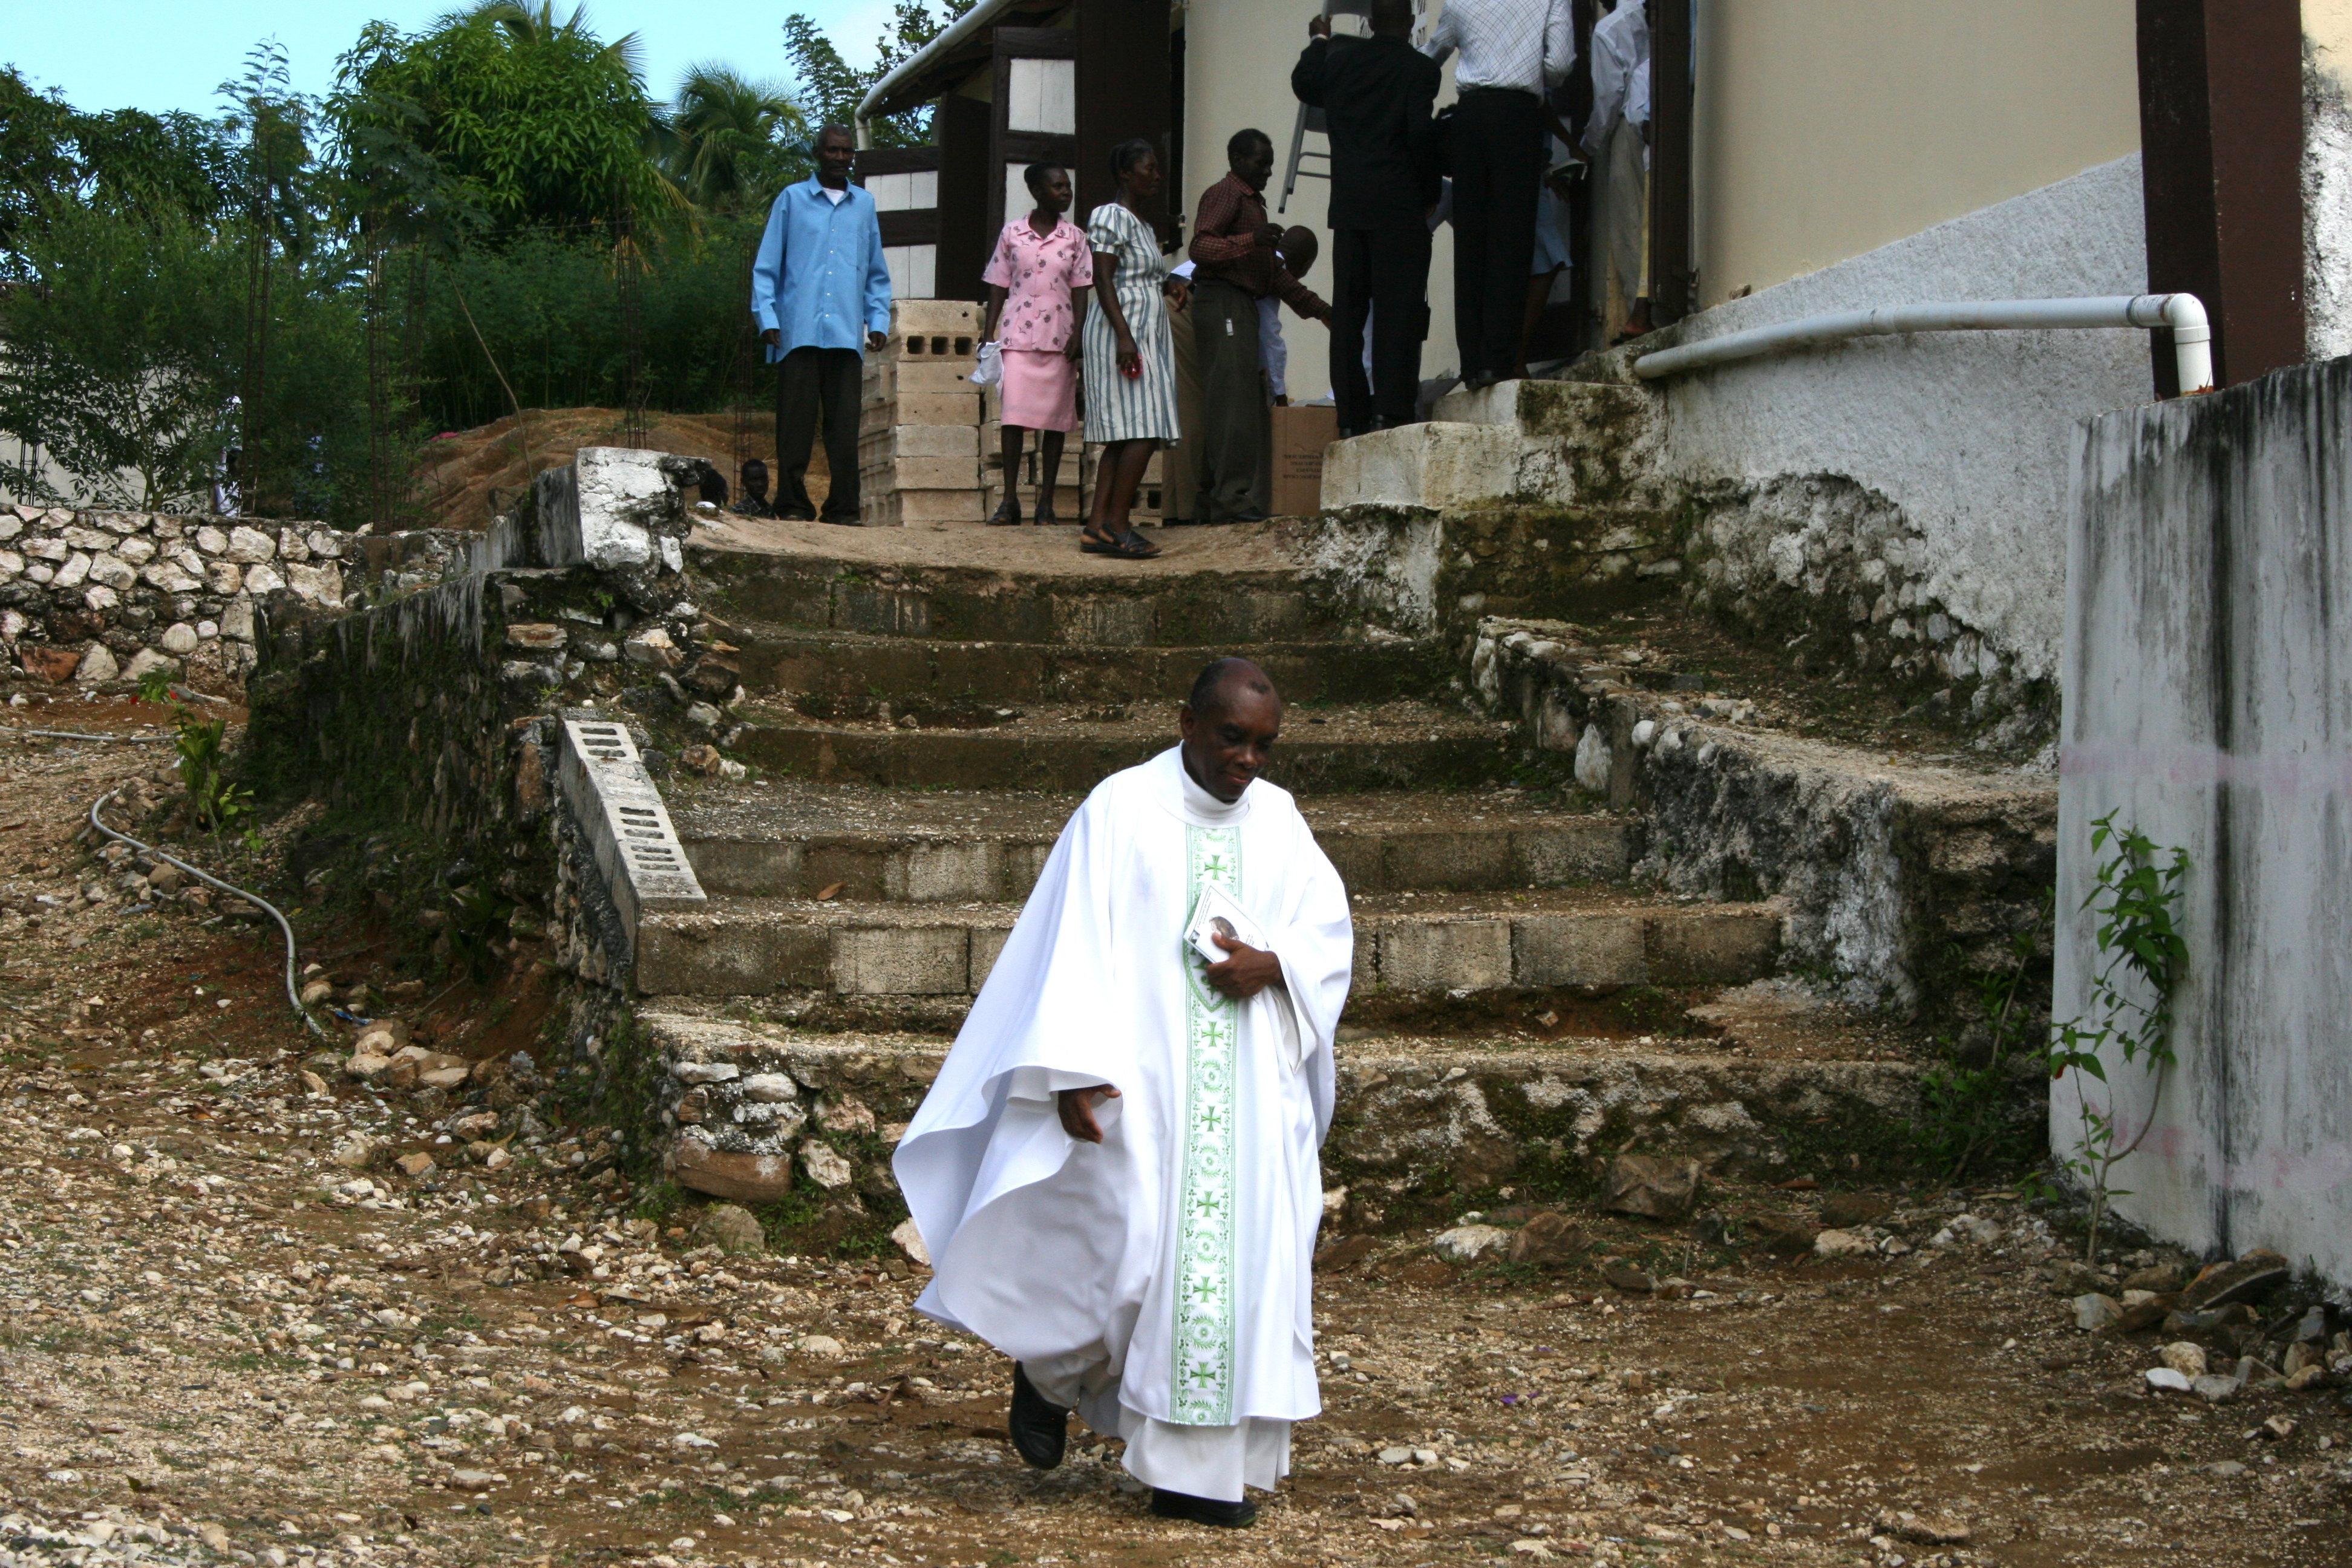 Father Joseph leaving